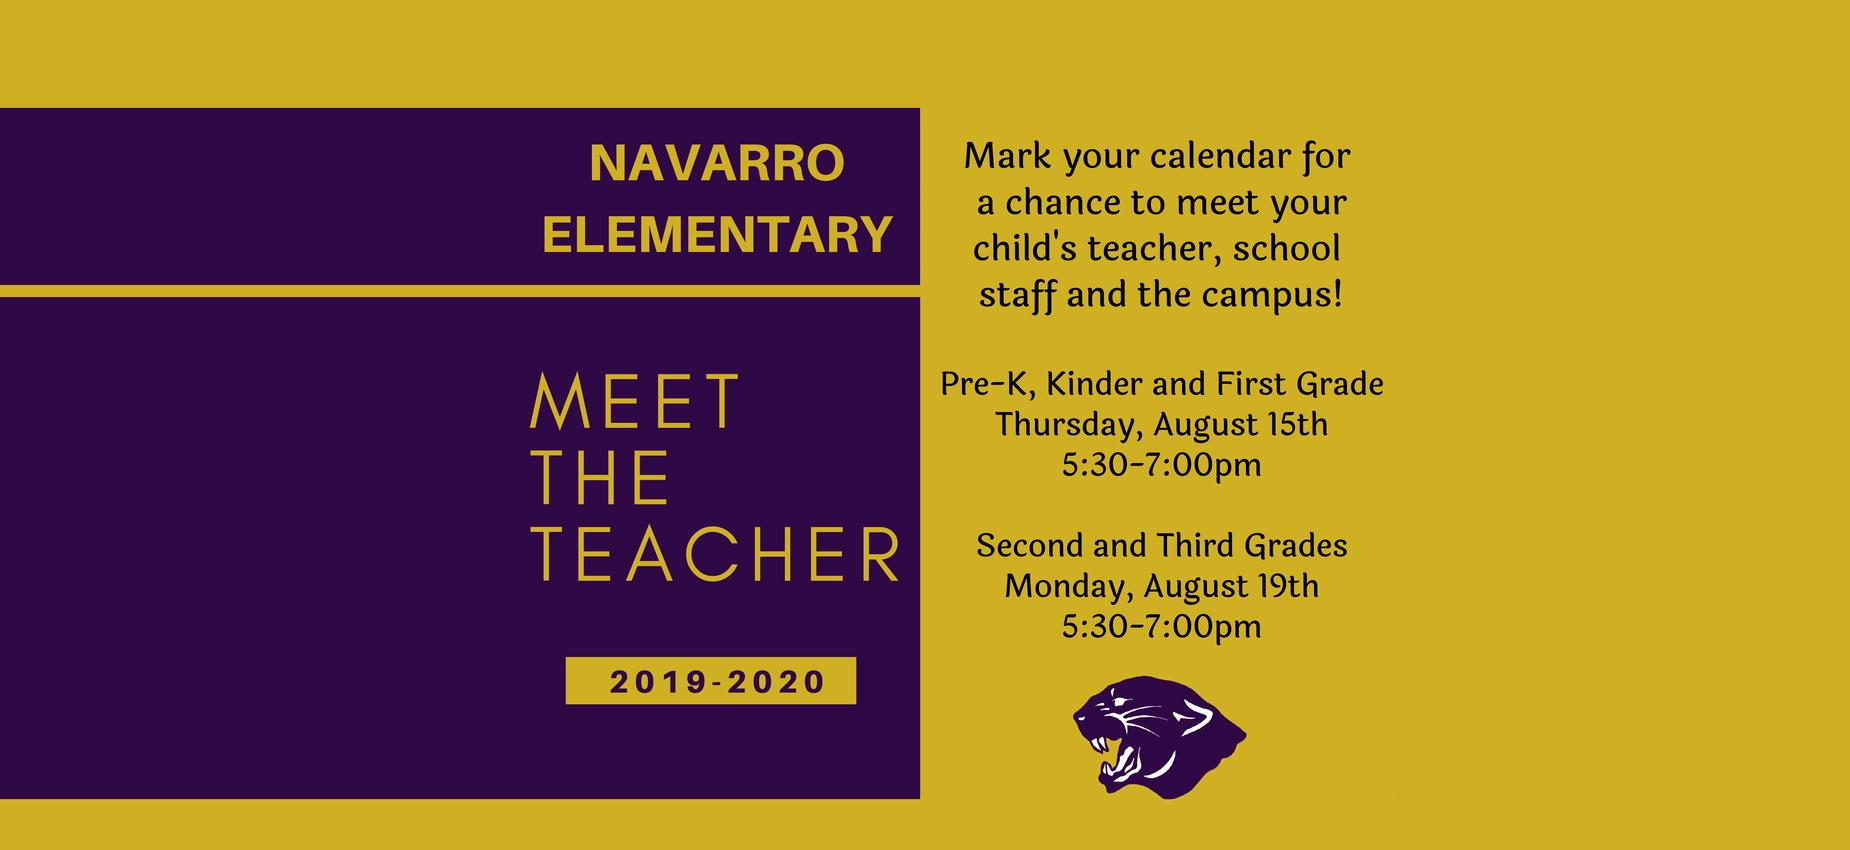 Navarro Elementary School